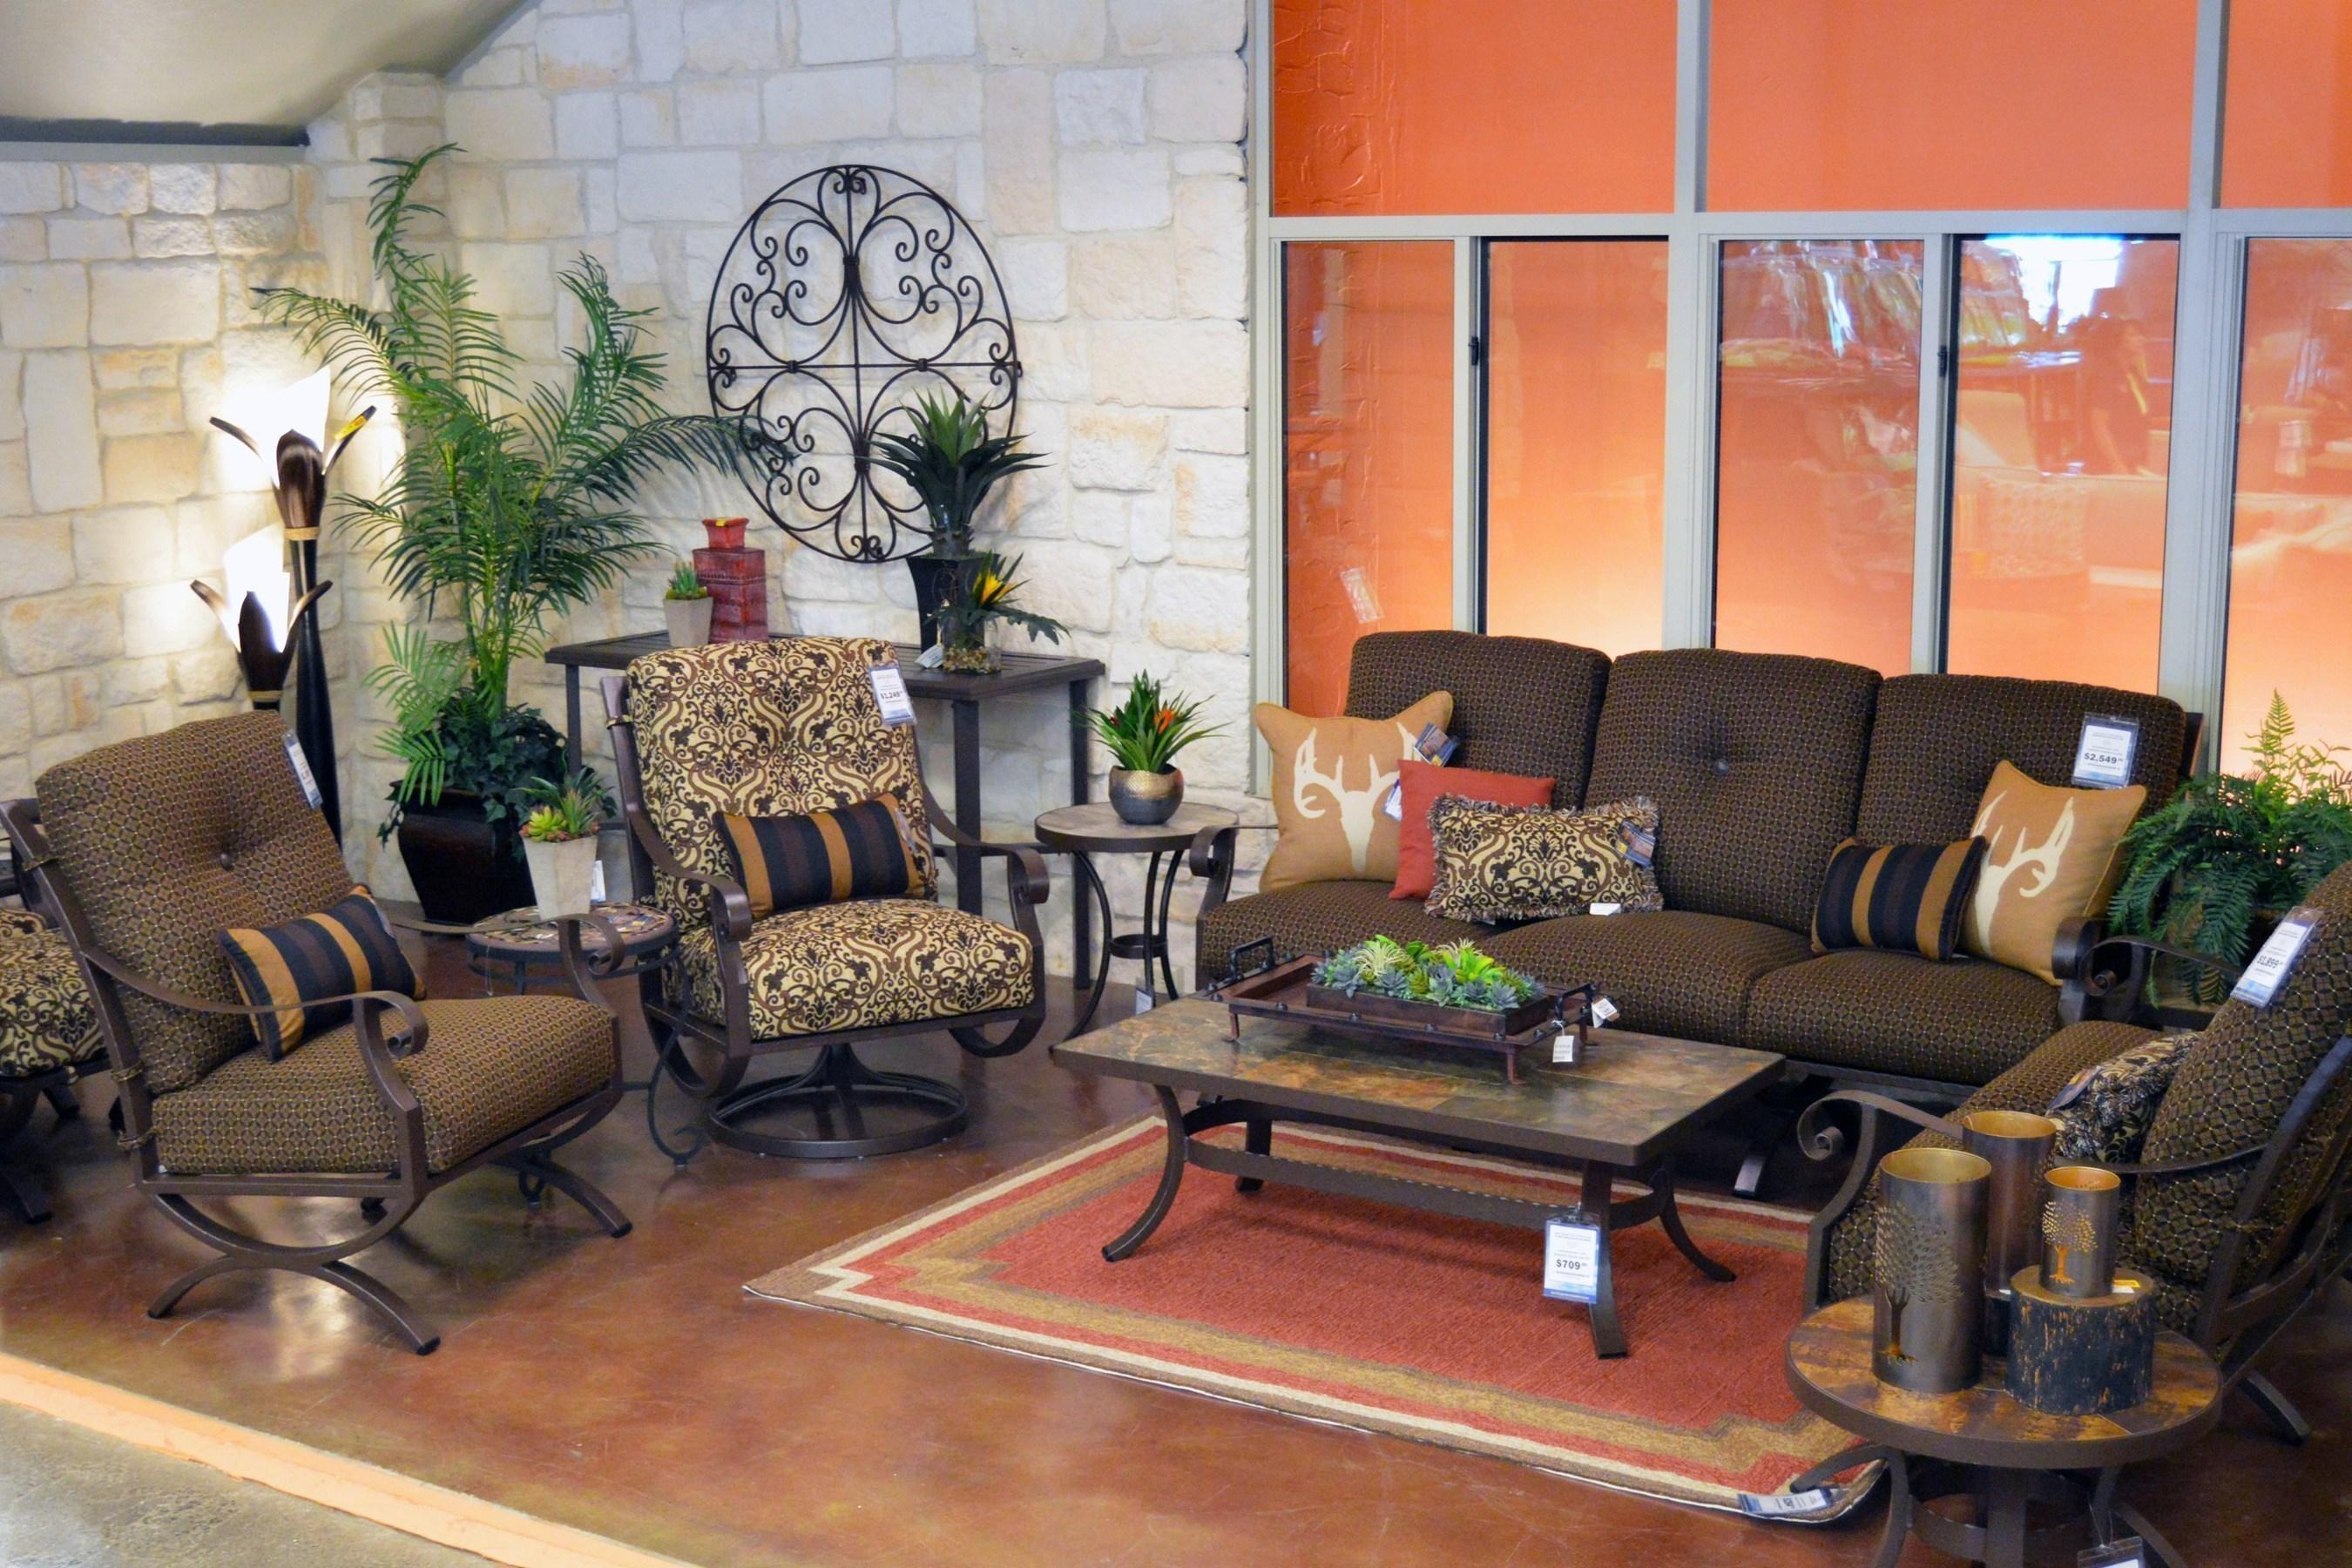 Sunnyland Patio Furniture Nominated For 2016 Apollo Award